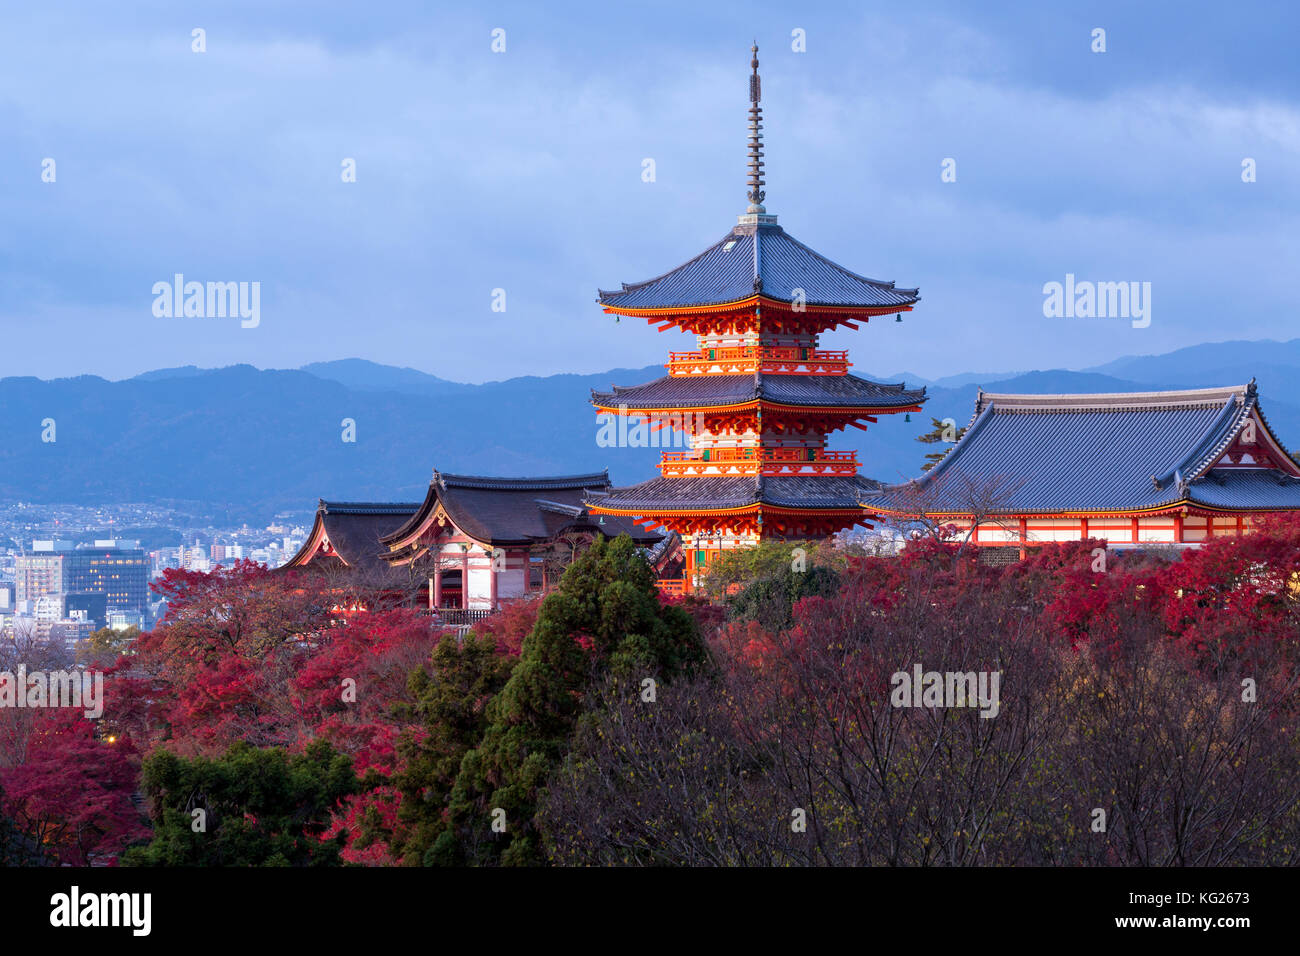 Kiyomizu-dera Tempel, Weltkulturerbe der UNESCO, Kyoto, Honshu, Japan, Asien Stockbild